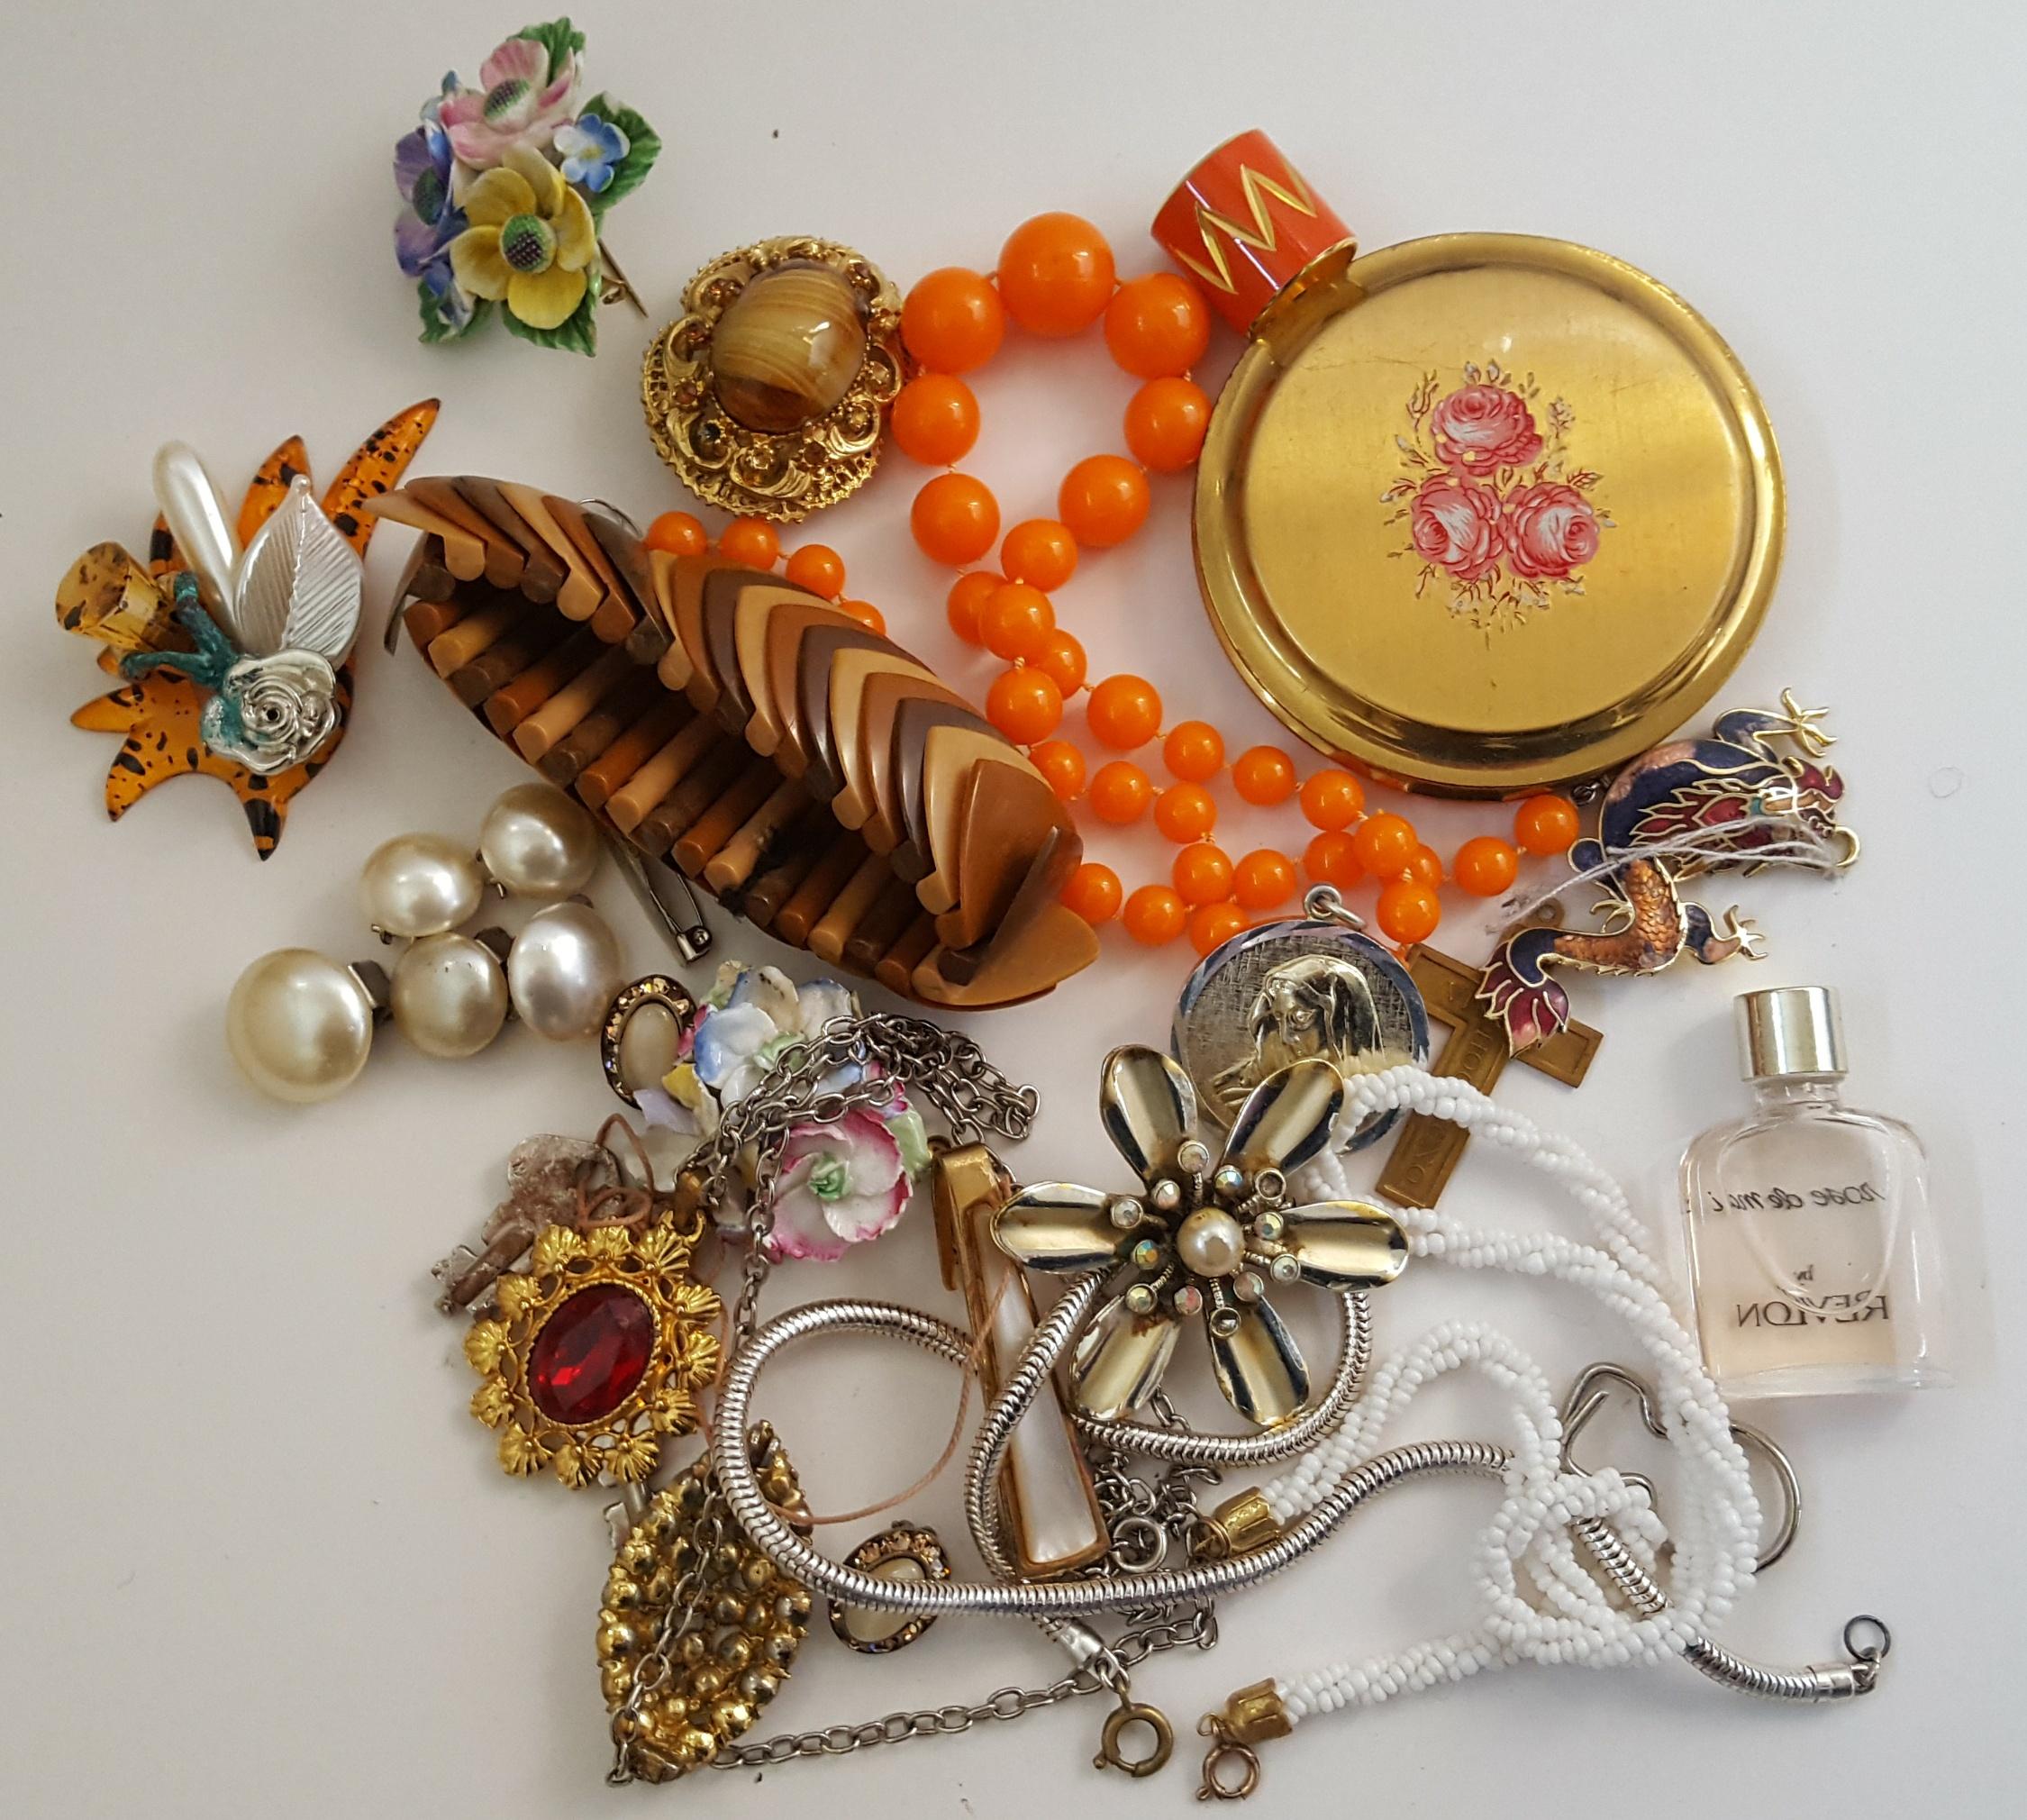 Lot 22 - Parcel of Vintage Retro Costume Jewellery